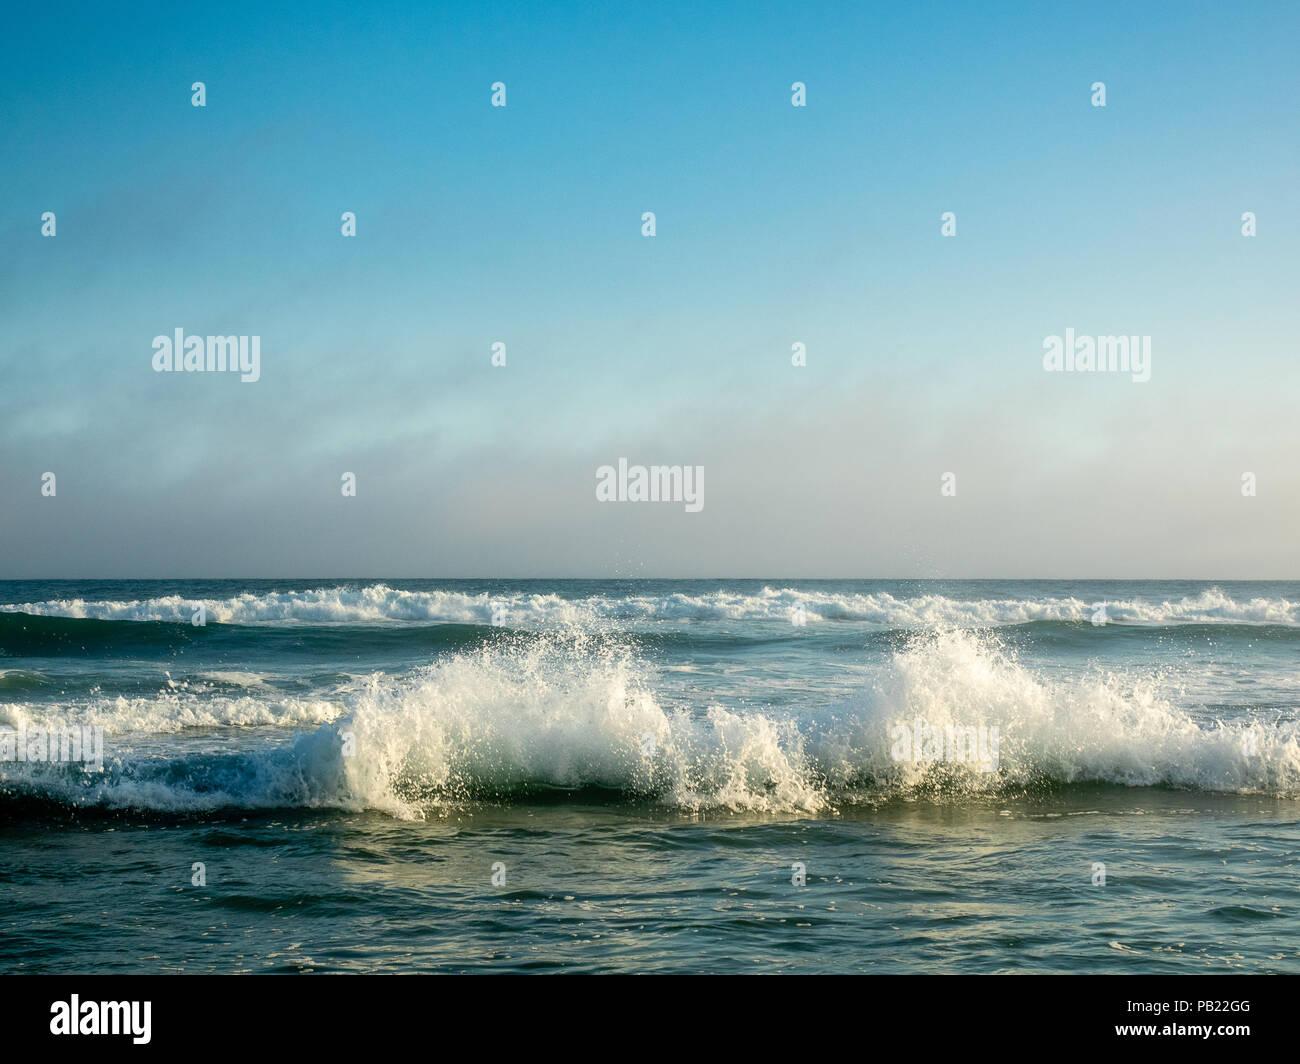 Waves crashing on ocean shore, The Hamptons, New York, USA. - Stock Image